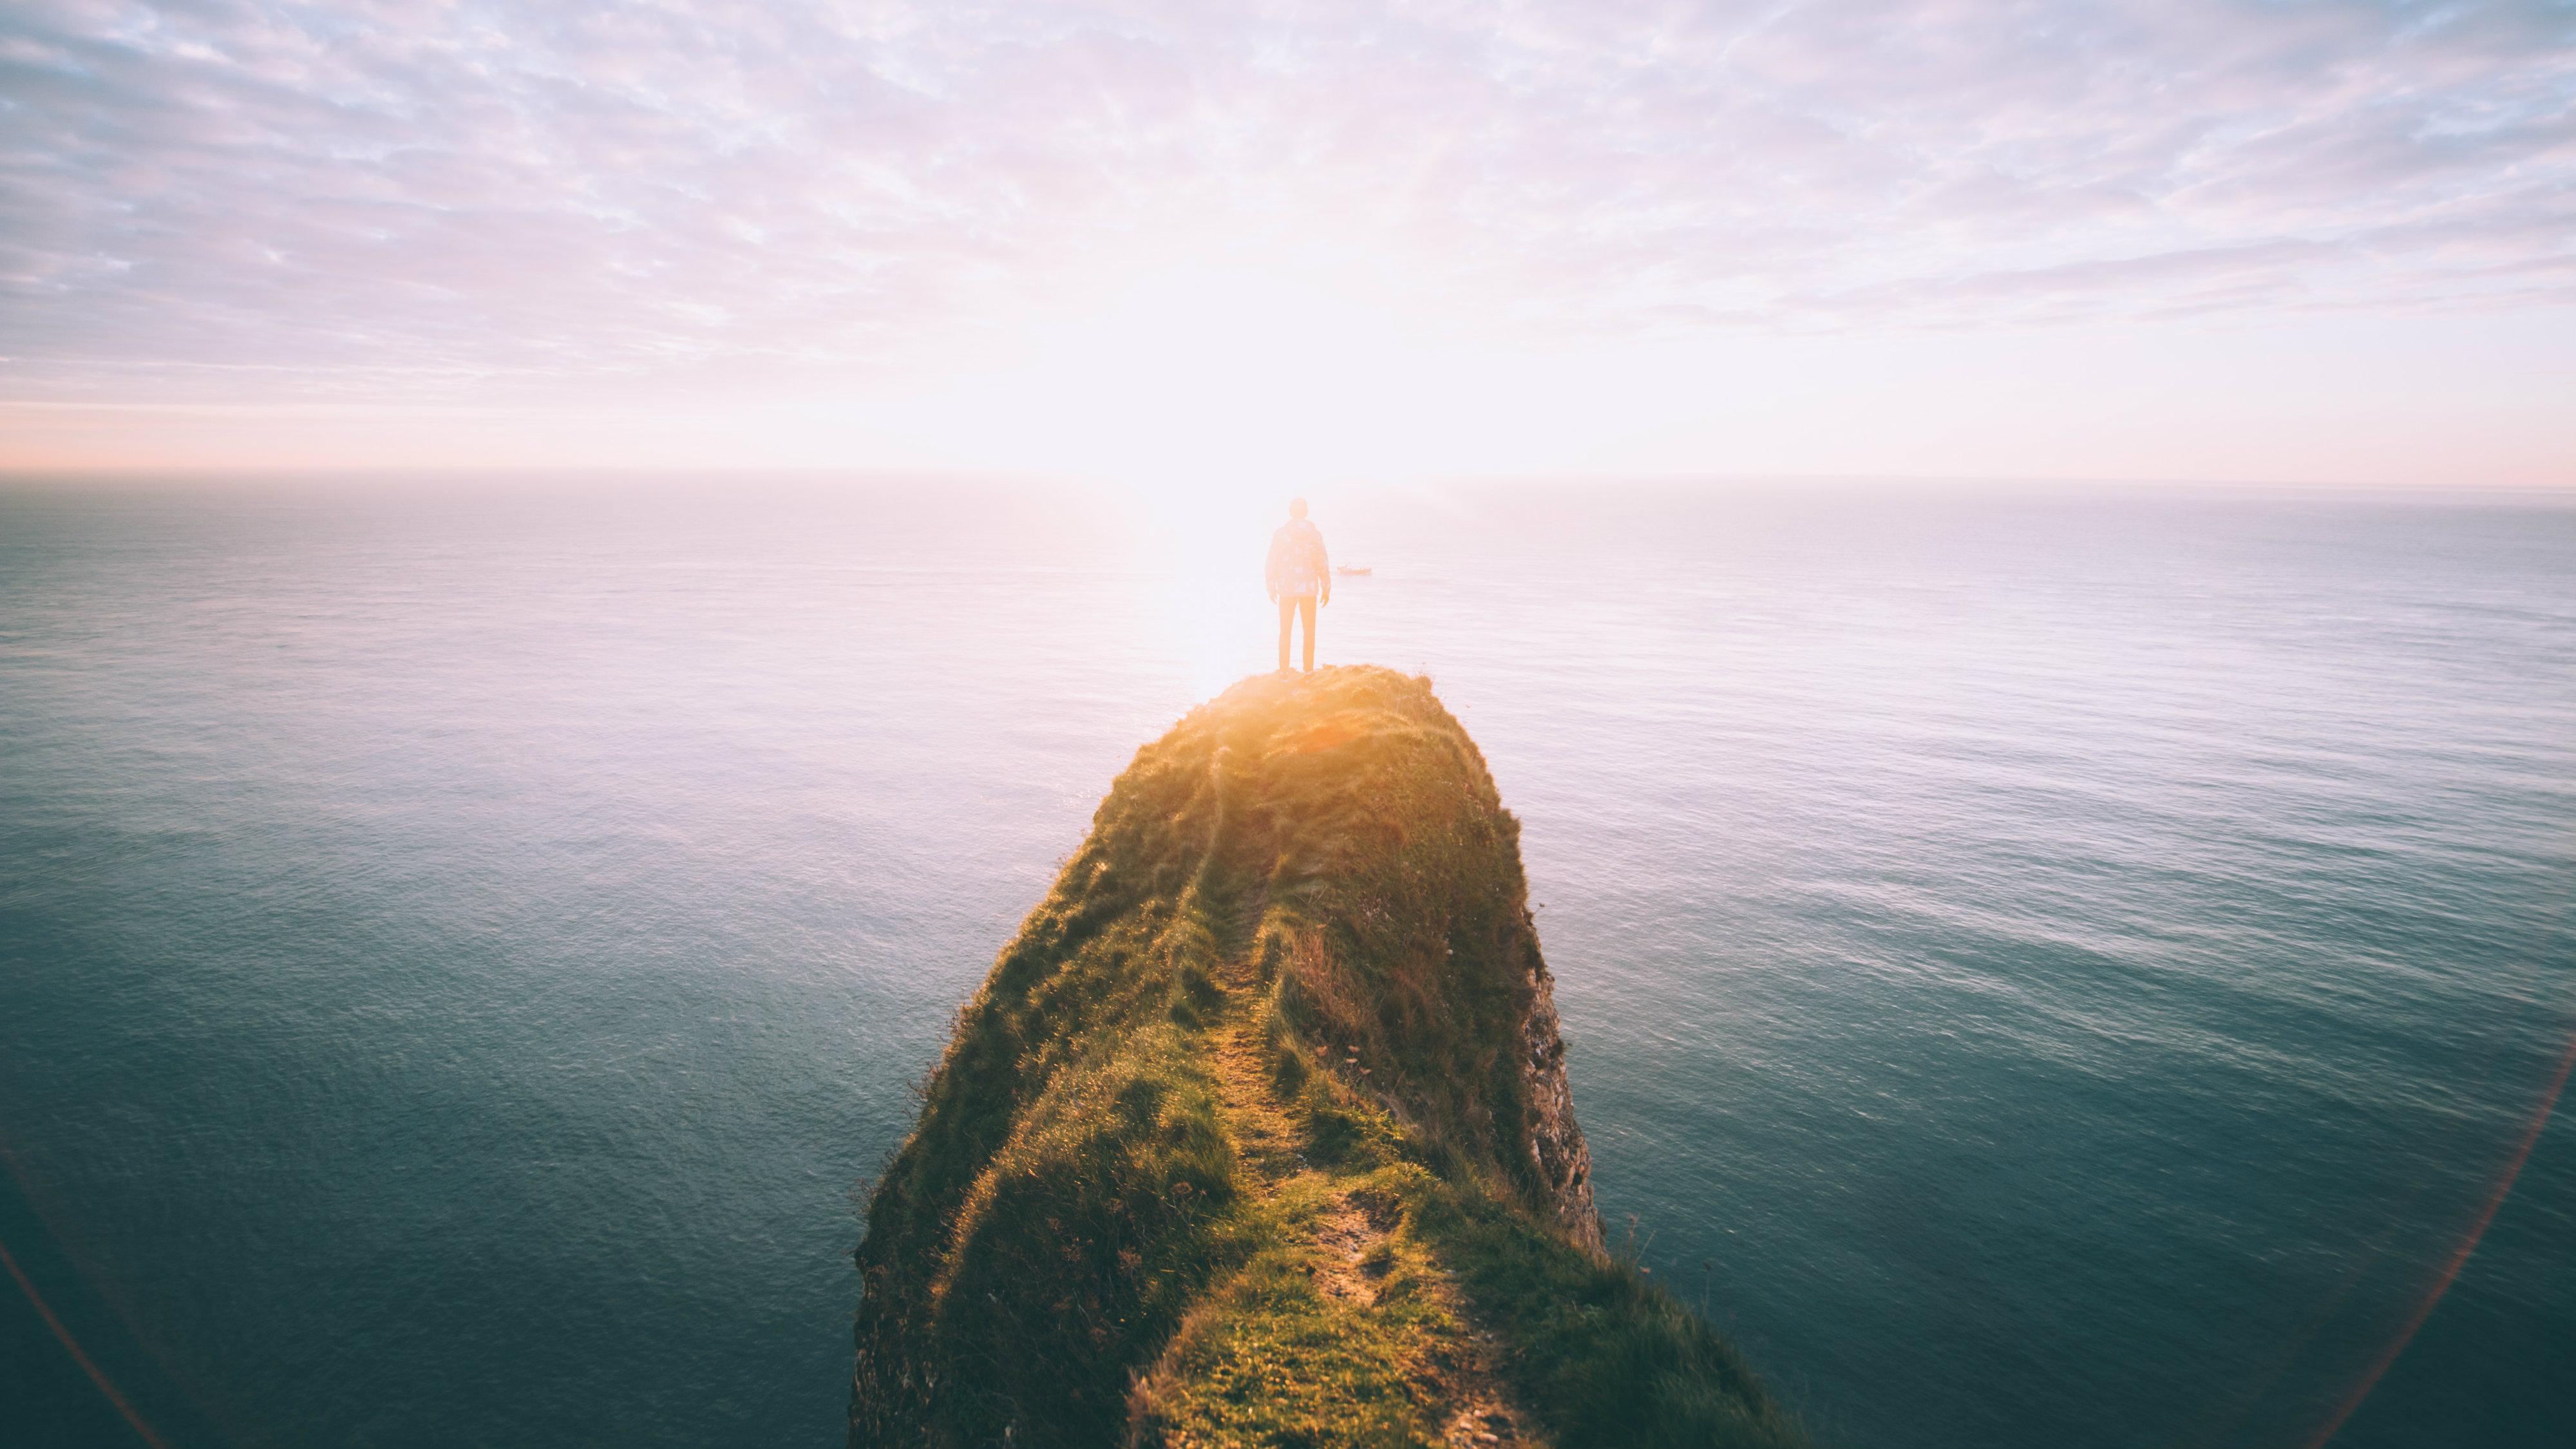 Man looking at ocean from precipice